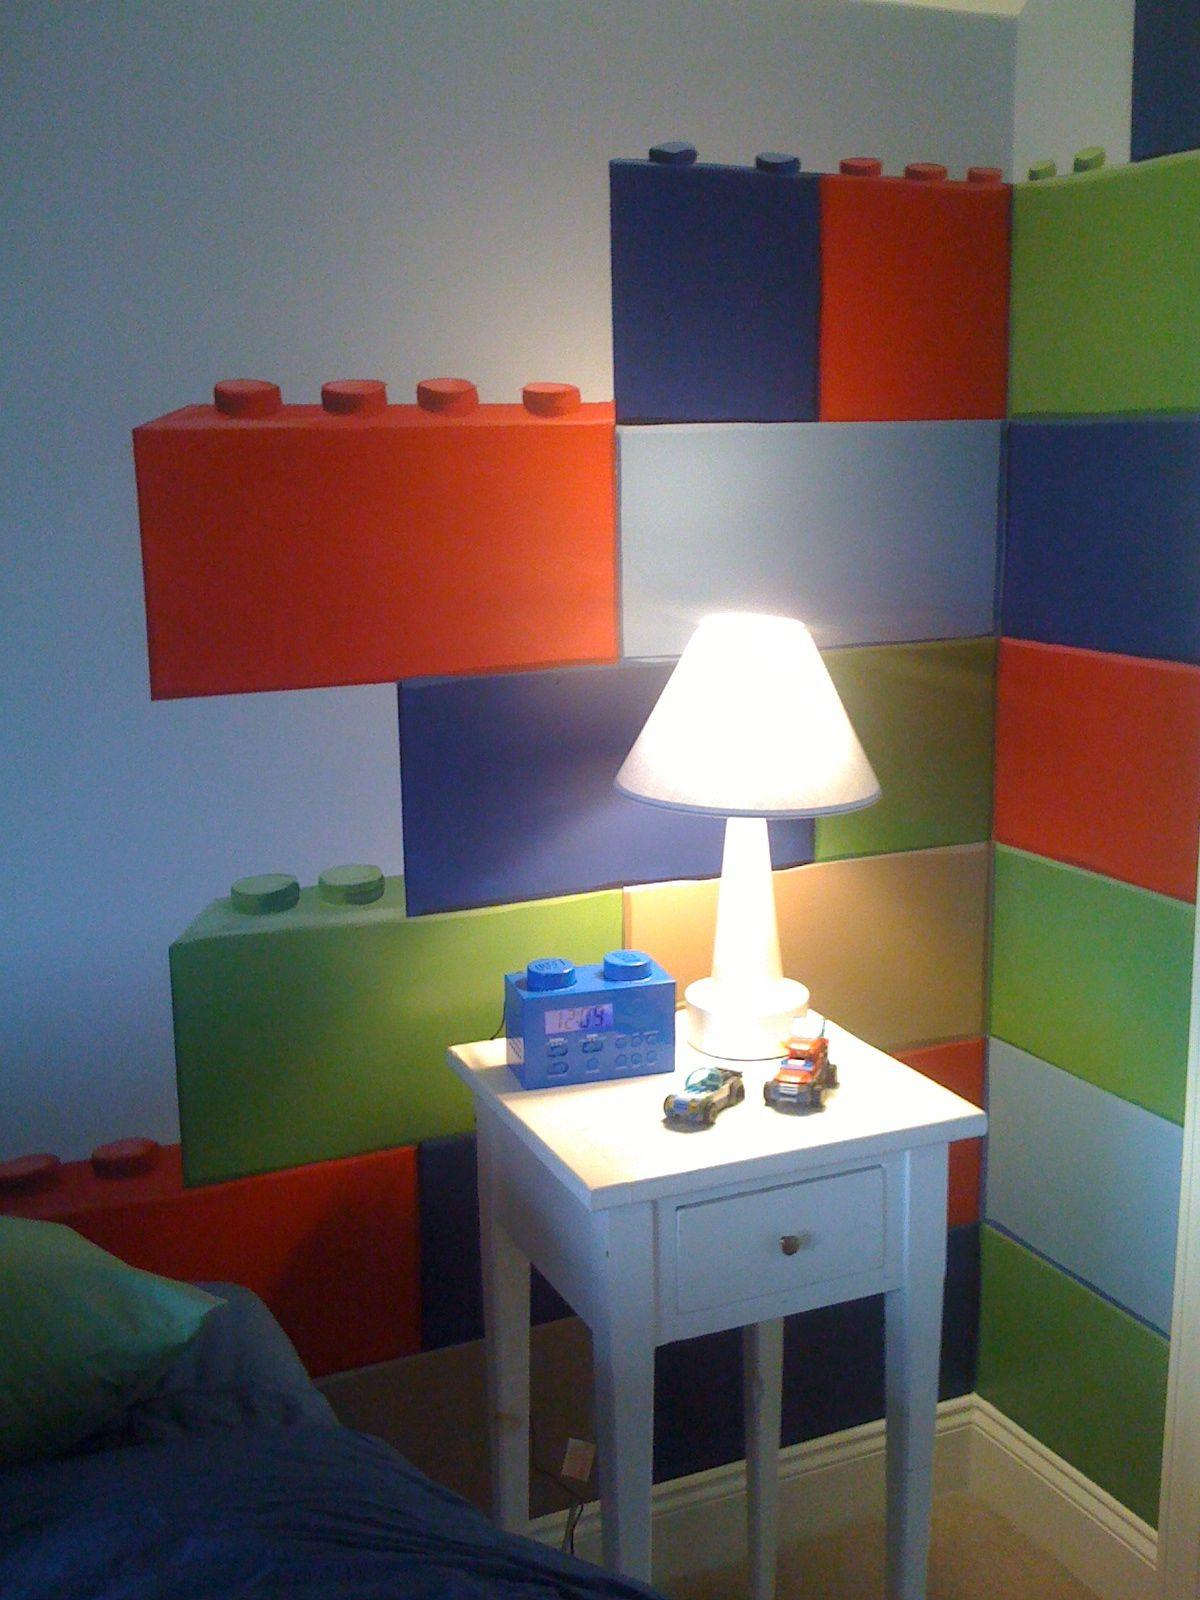 Lego Room With Big Bricks Wall Decals Lego Room In 2019